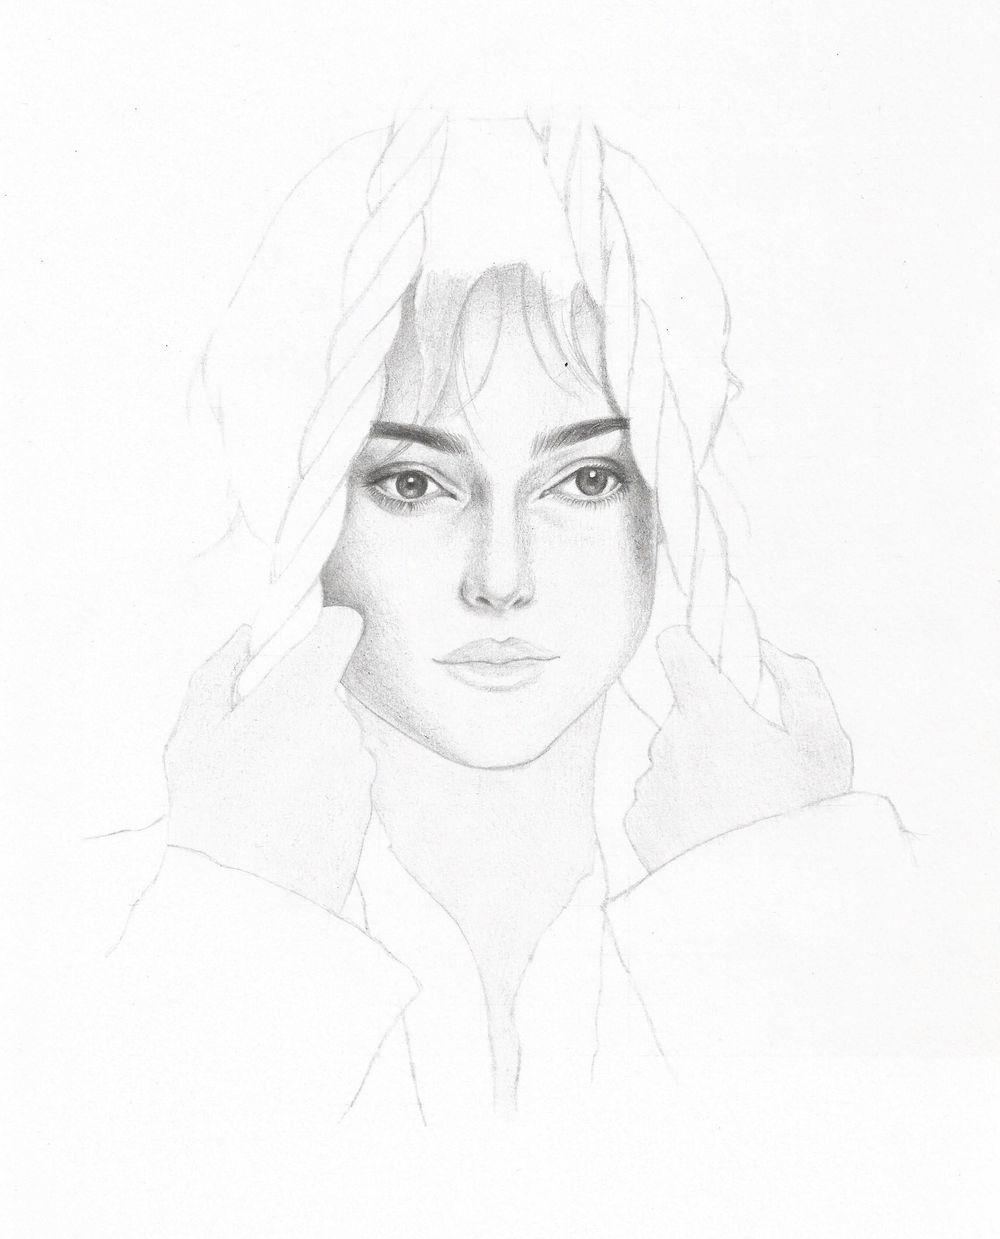 Portrait: Keira Knightley as Elizabeth Bennet - image 3 - student project